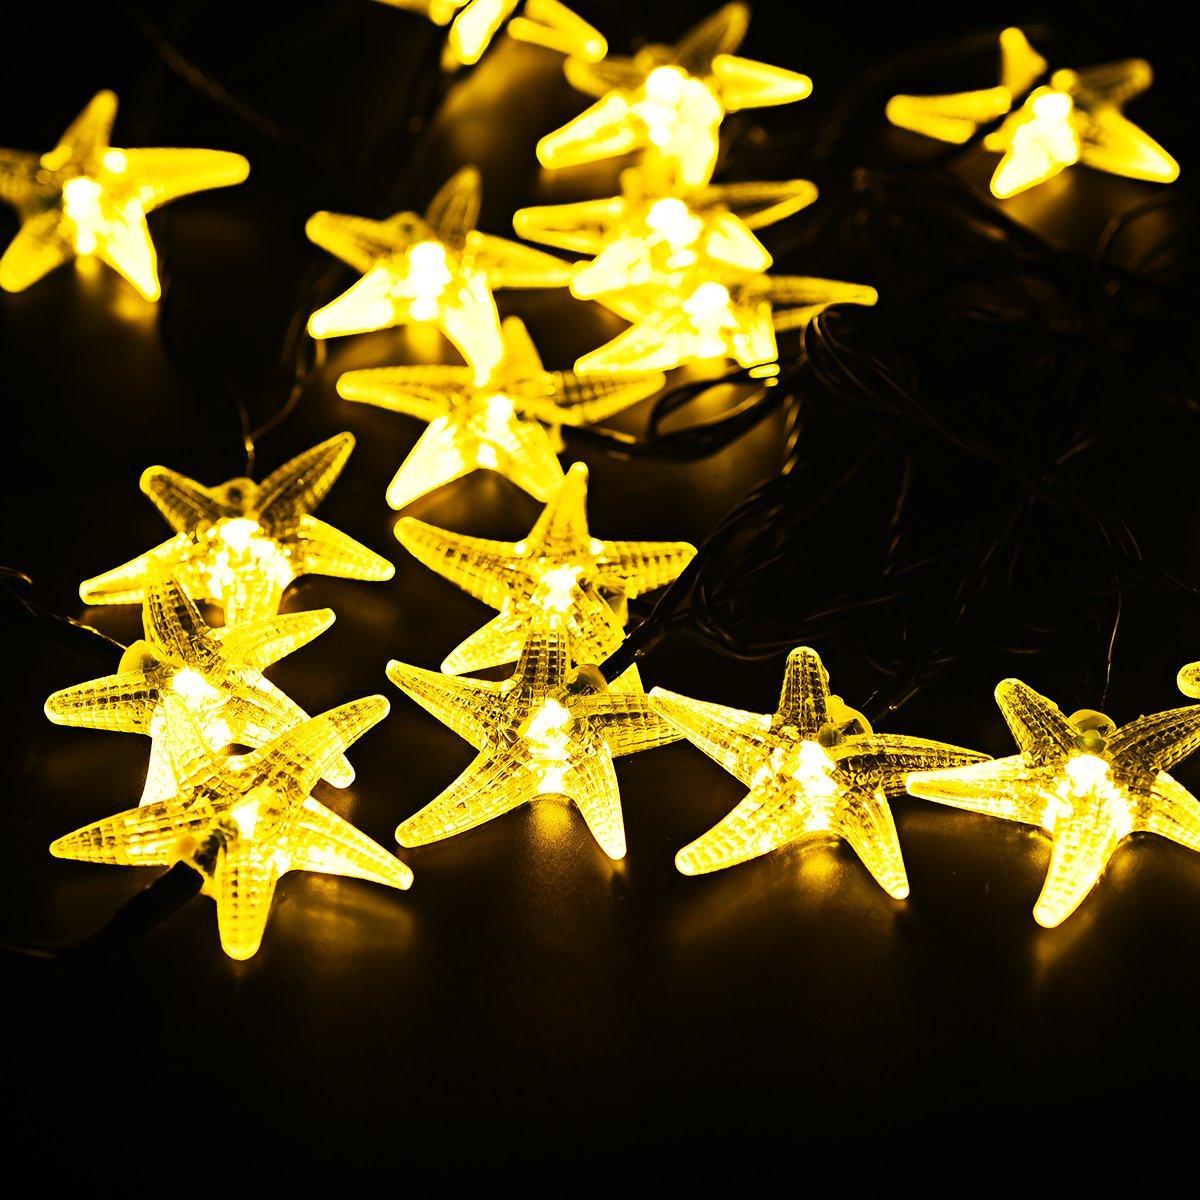 Guirnalda Luces m VicTsing LED Blanco Cálido Forma de Estrellas de Mar